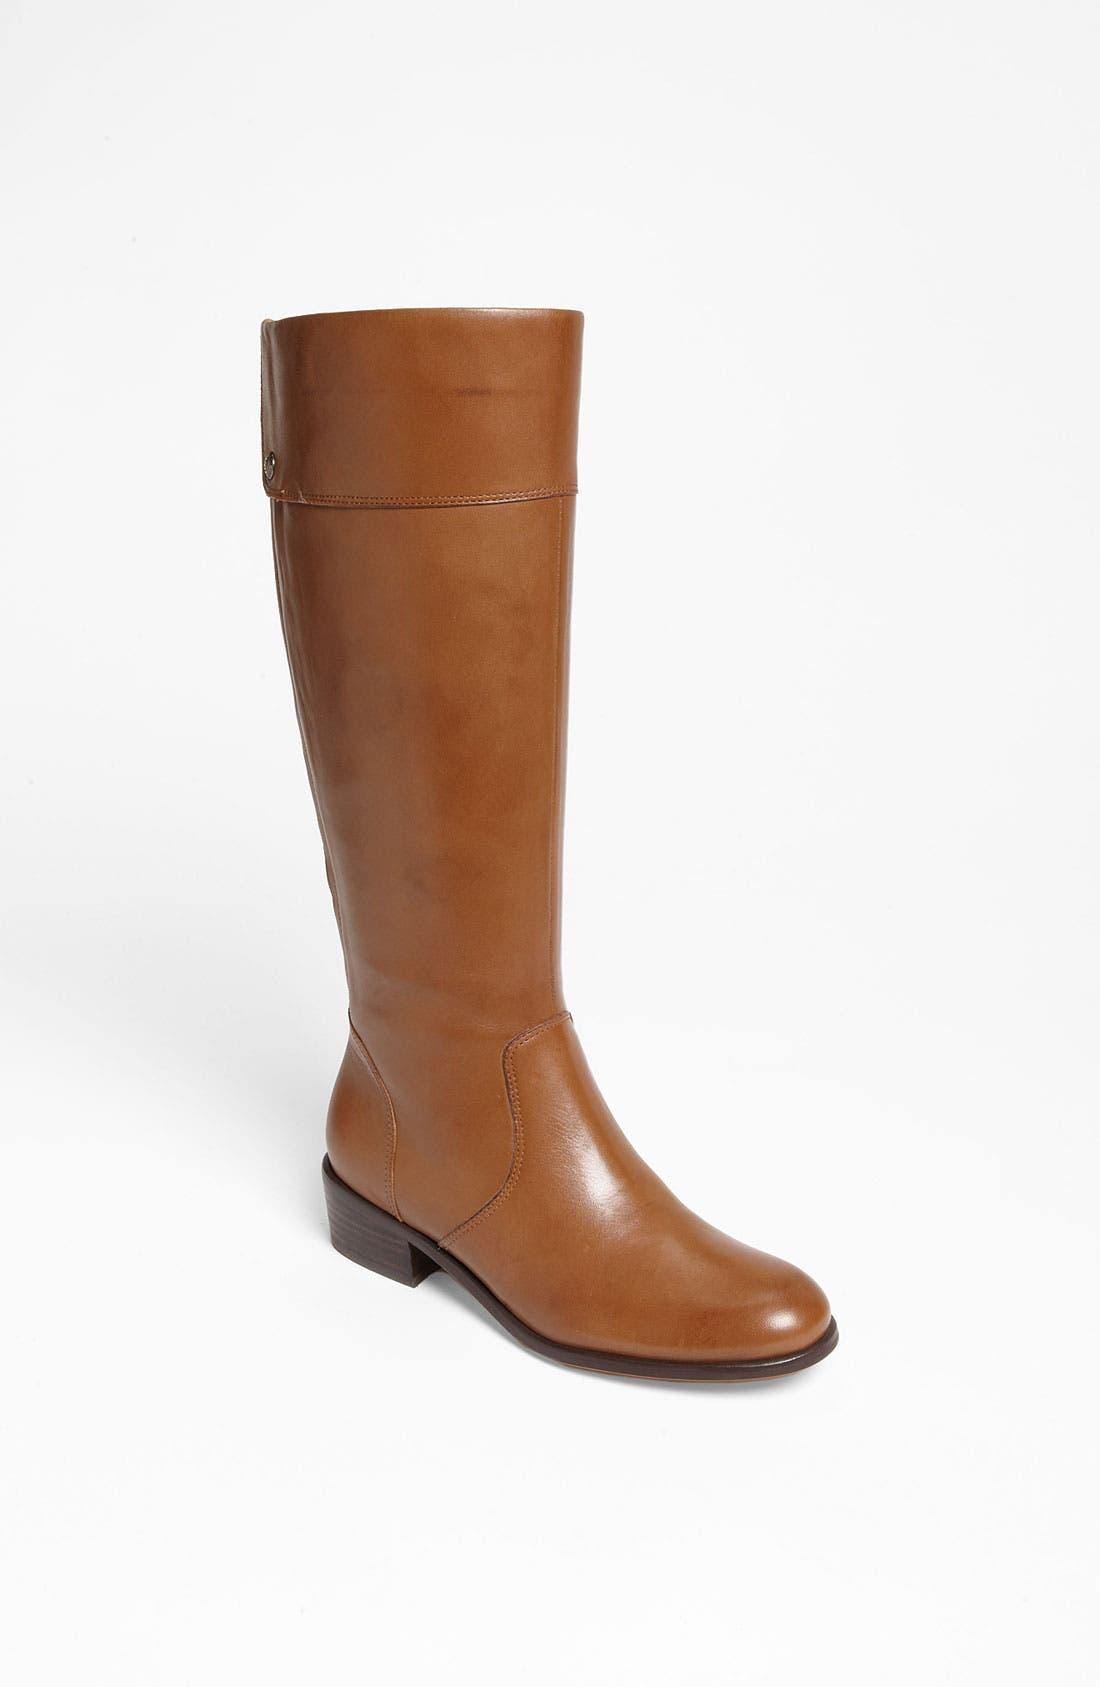 Alternate Image 1 Selected - Corso Como 'Samual' Boot (Nordstrom Exclusive)